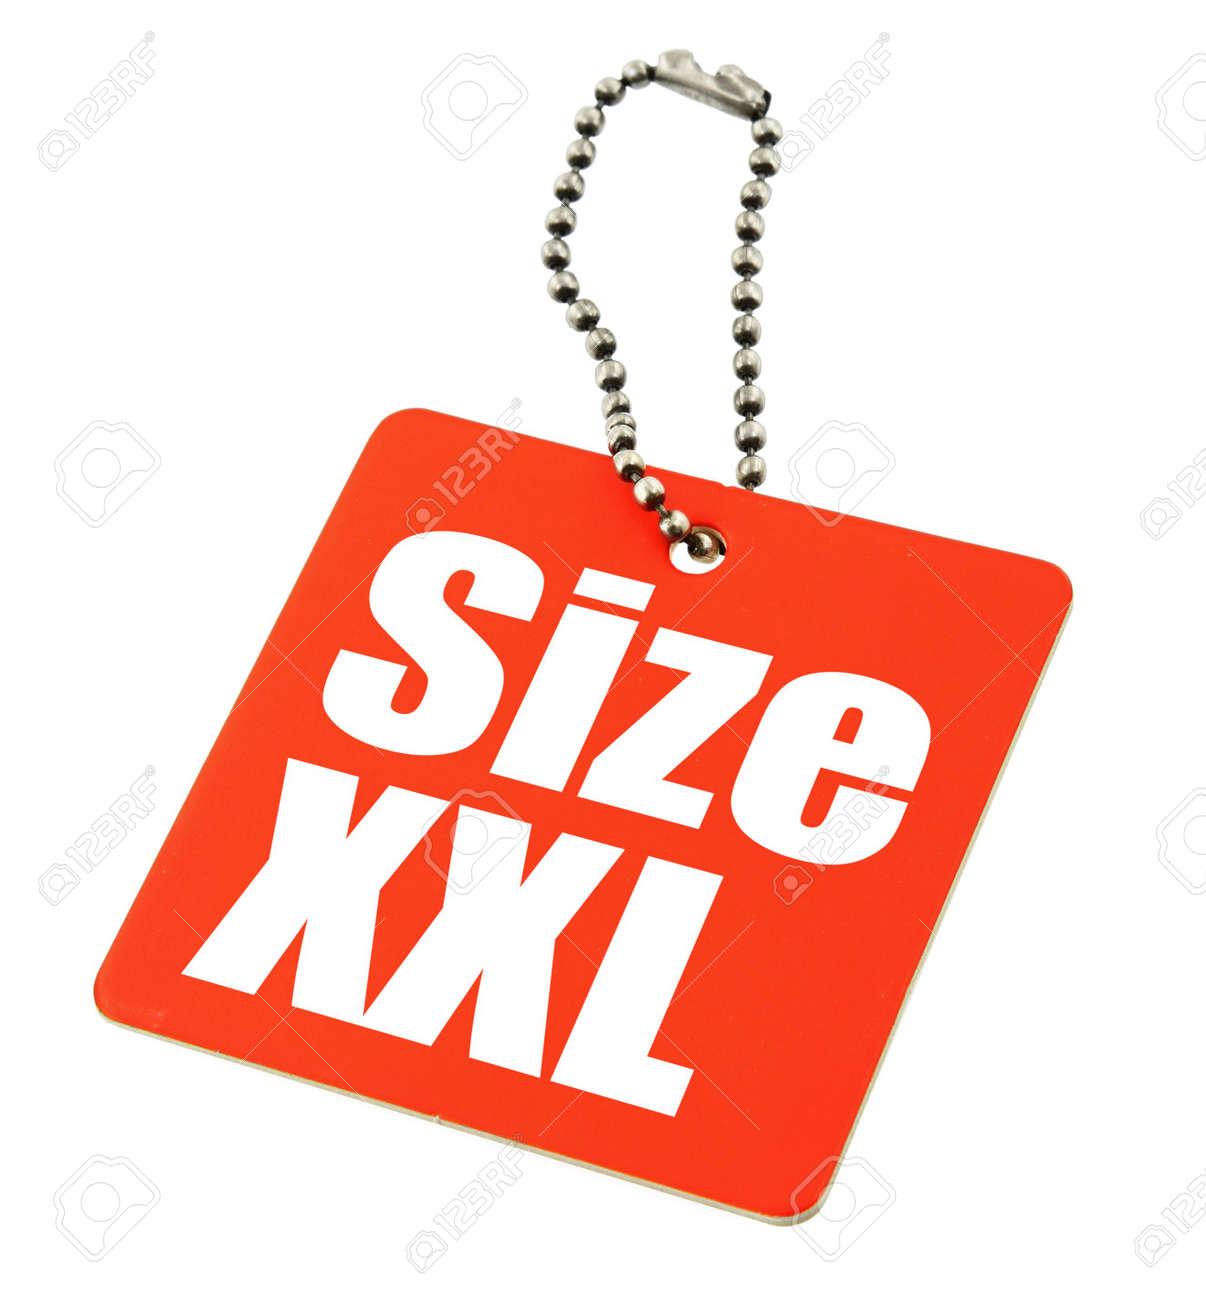 XXL Size Tag isolated on white background, the photo does not infringe any copyright Stock Photo - 2558328